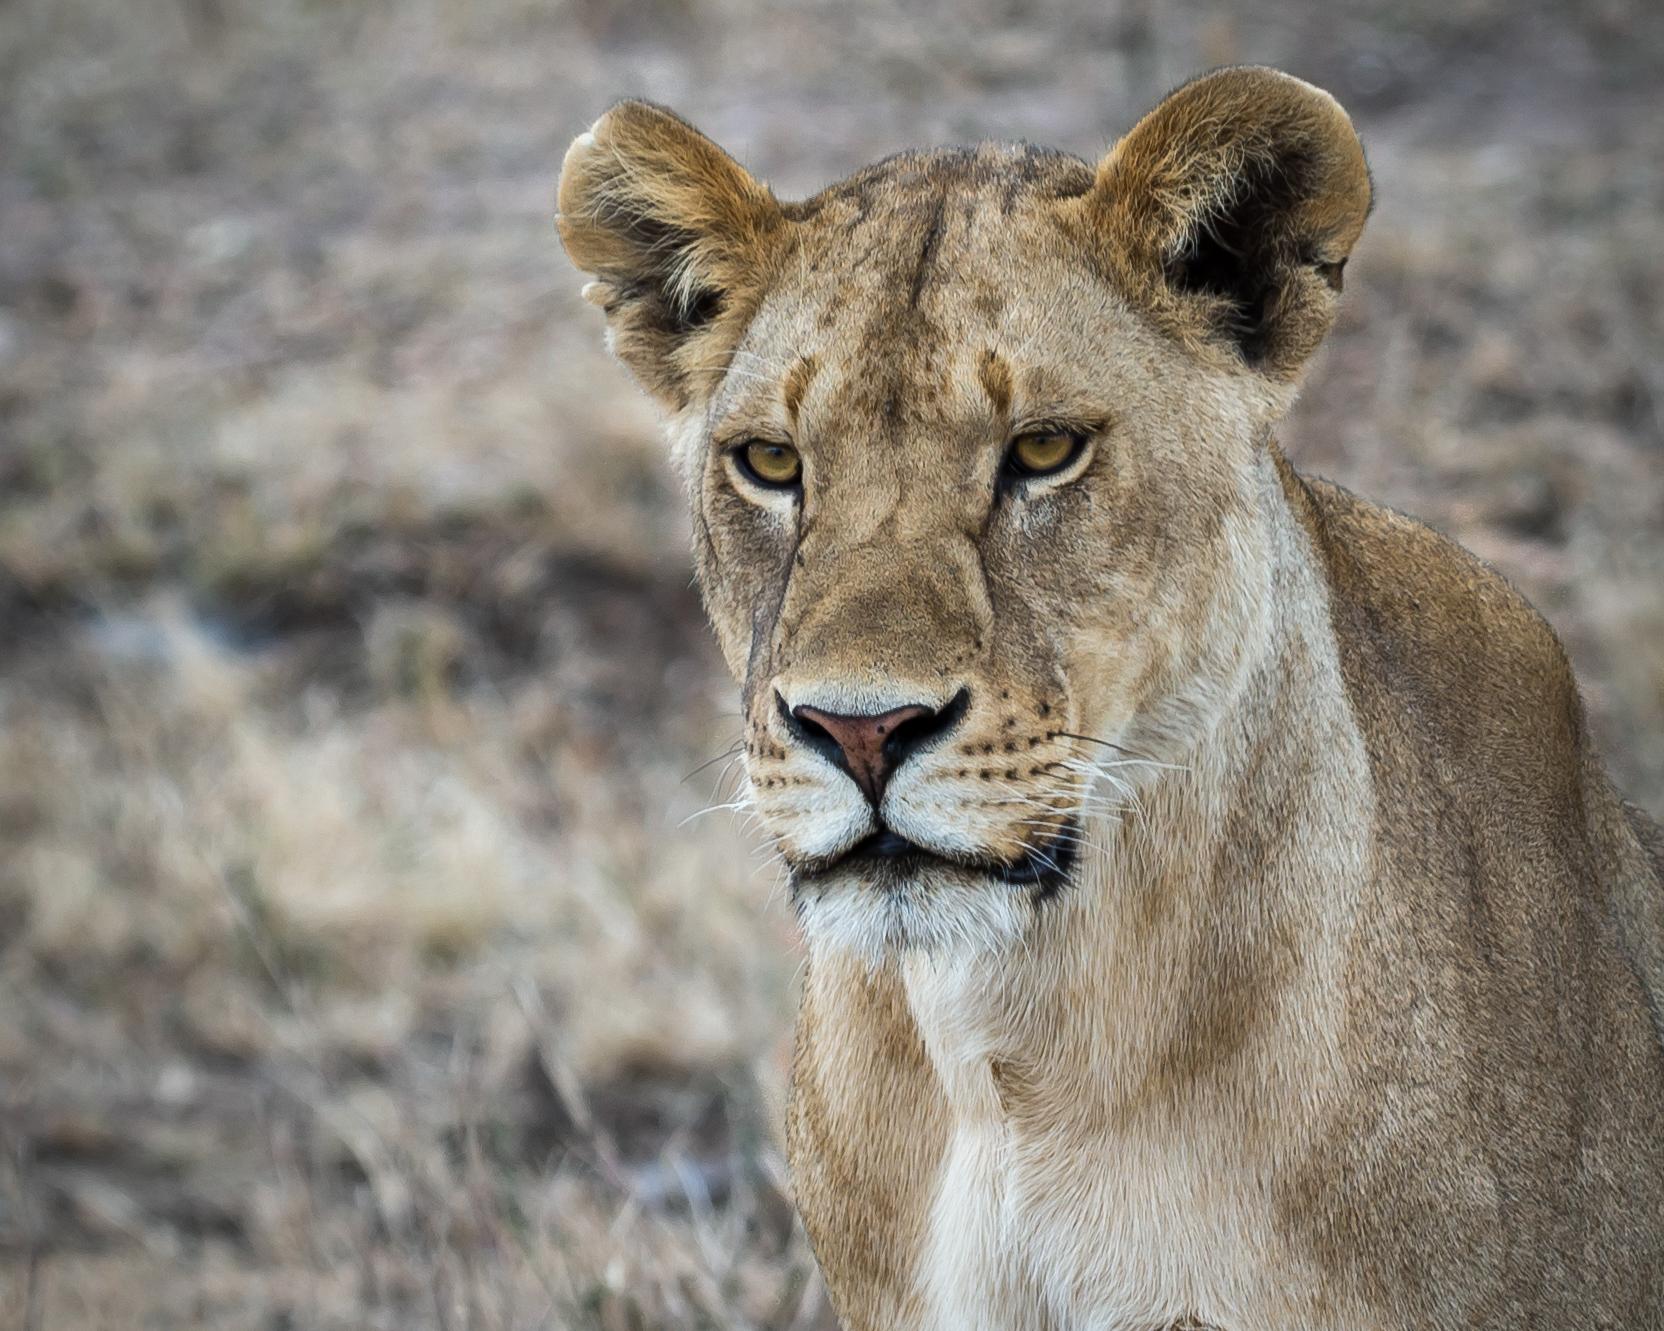 Lioness Mom